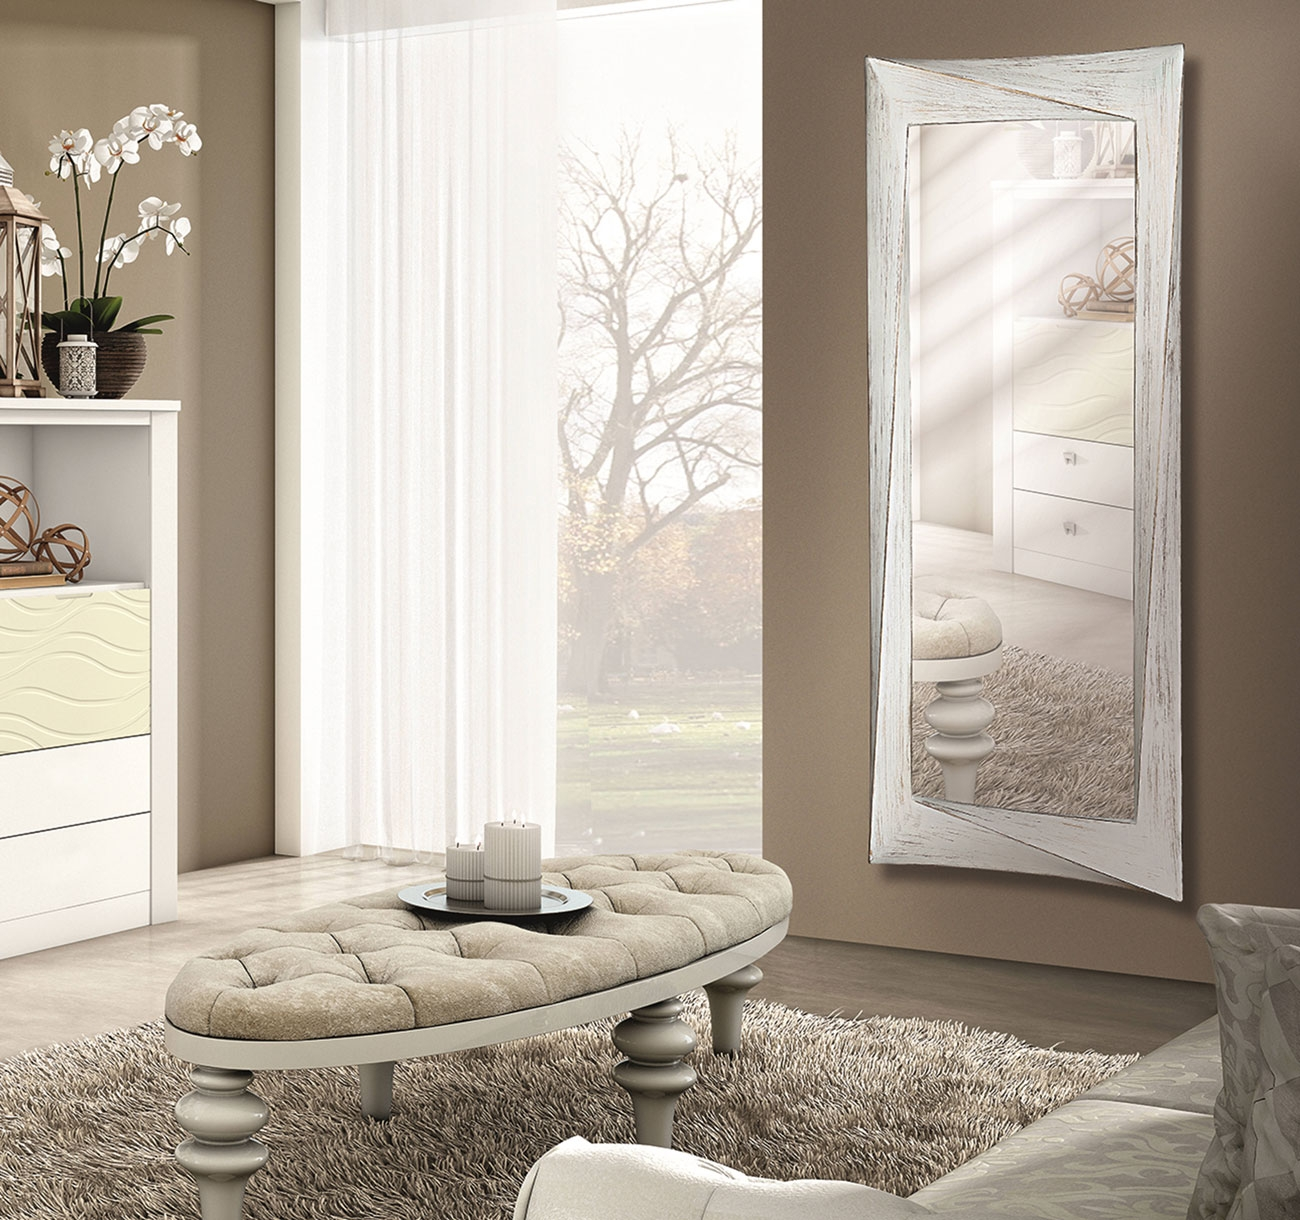 Espejo decorativo DECO 16199